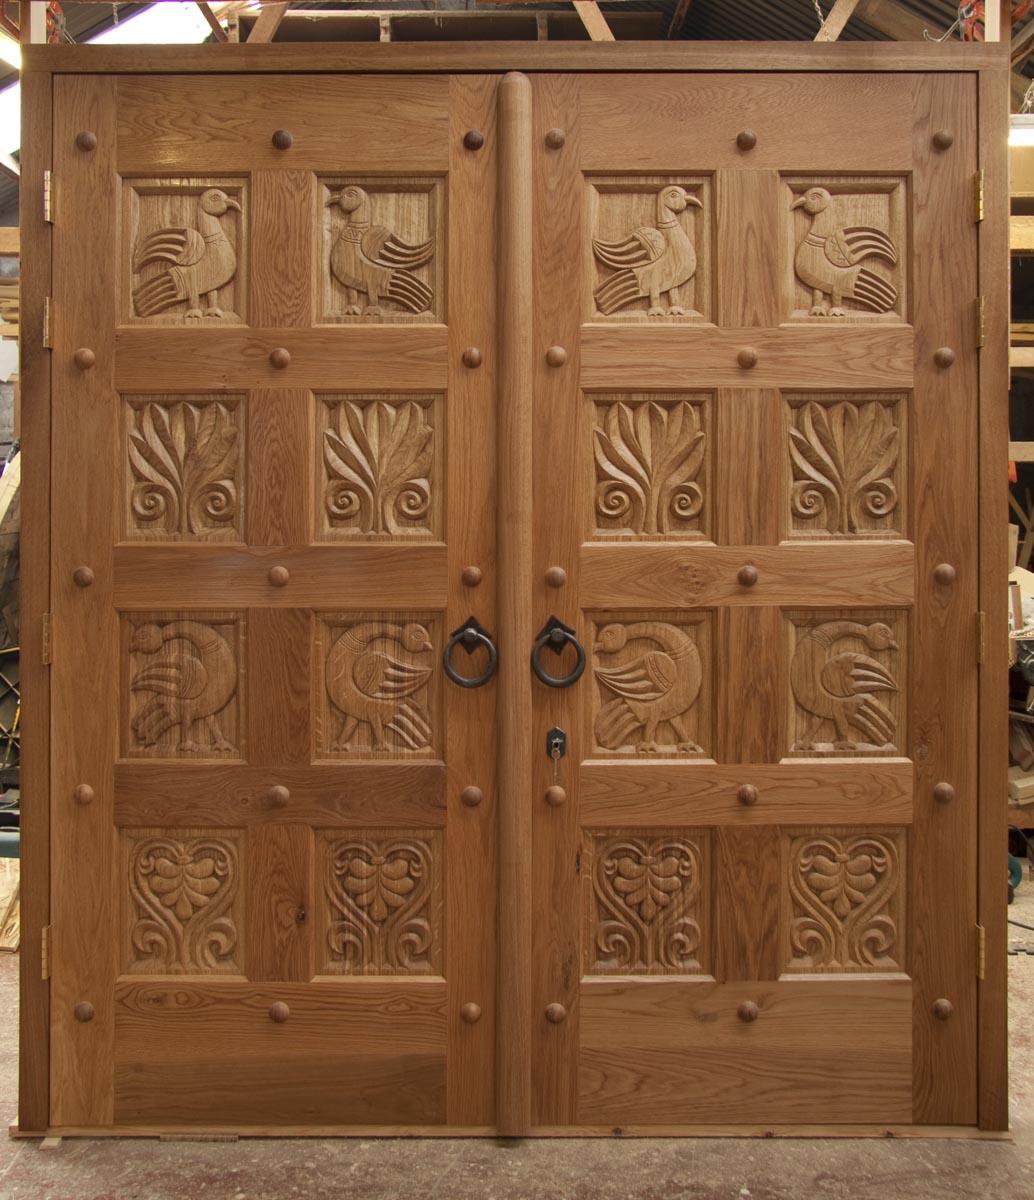 Doors for the church of mary magdalene madrid aidan